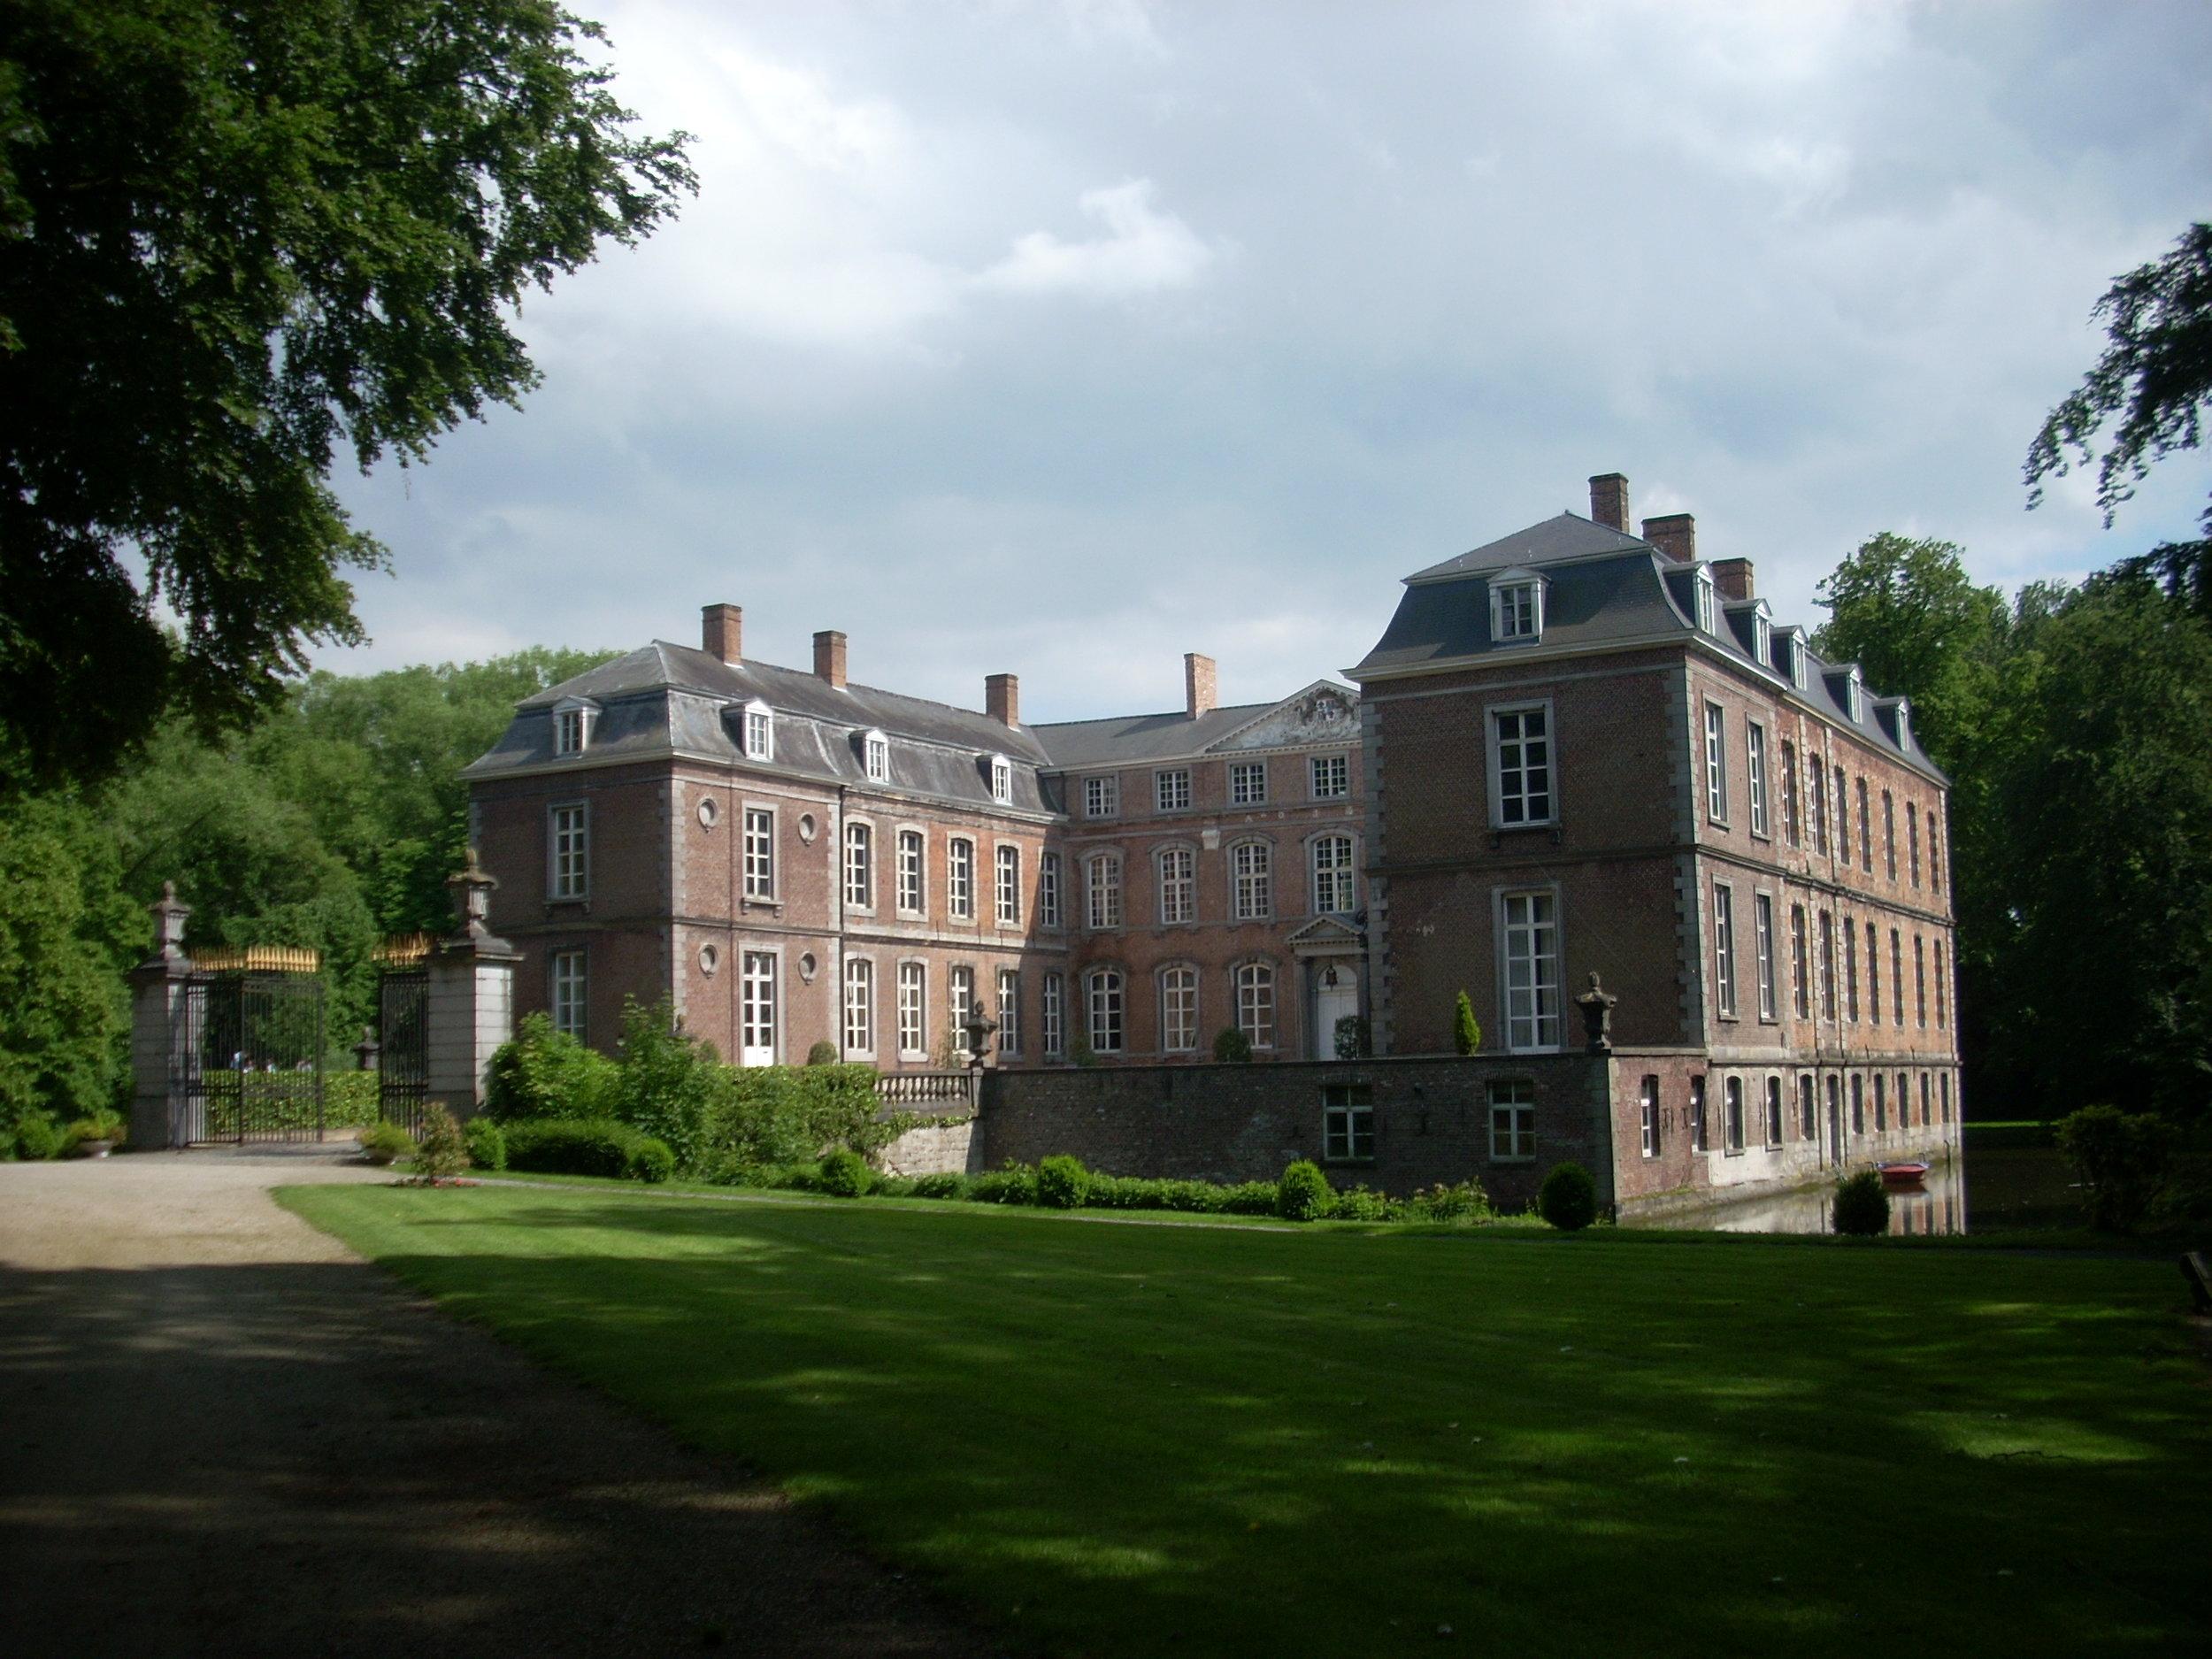 Van-Honsebrouck-kasteel